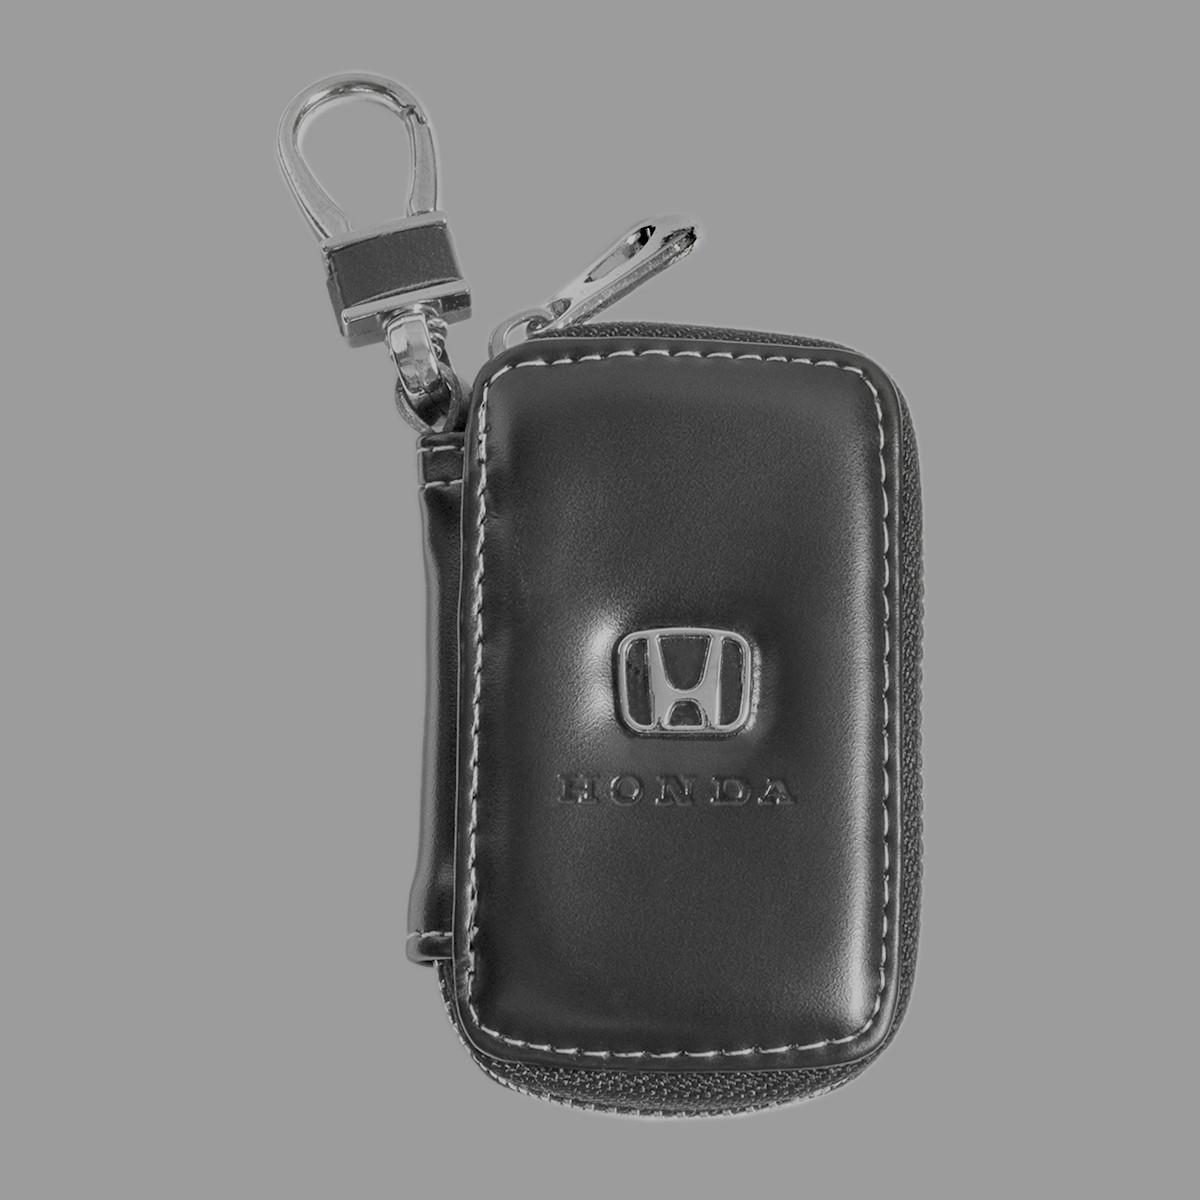 Ключница Carss с логотипом HONDA 08011 черная